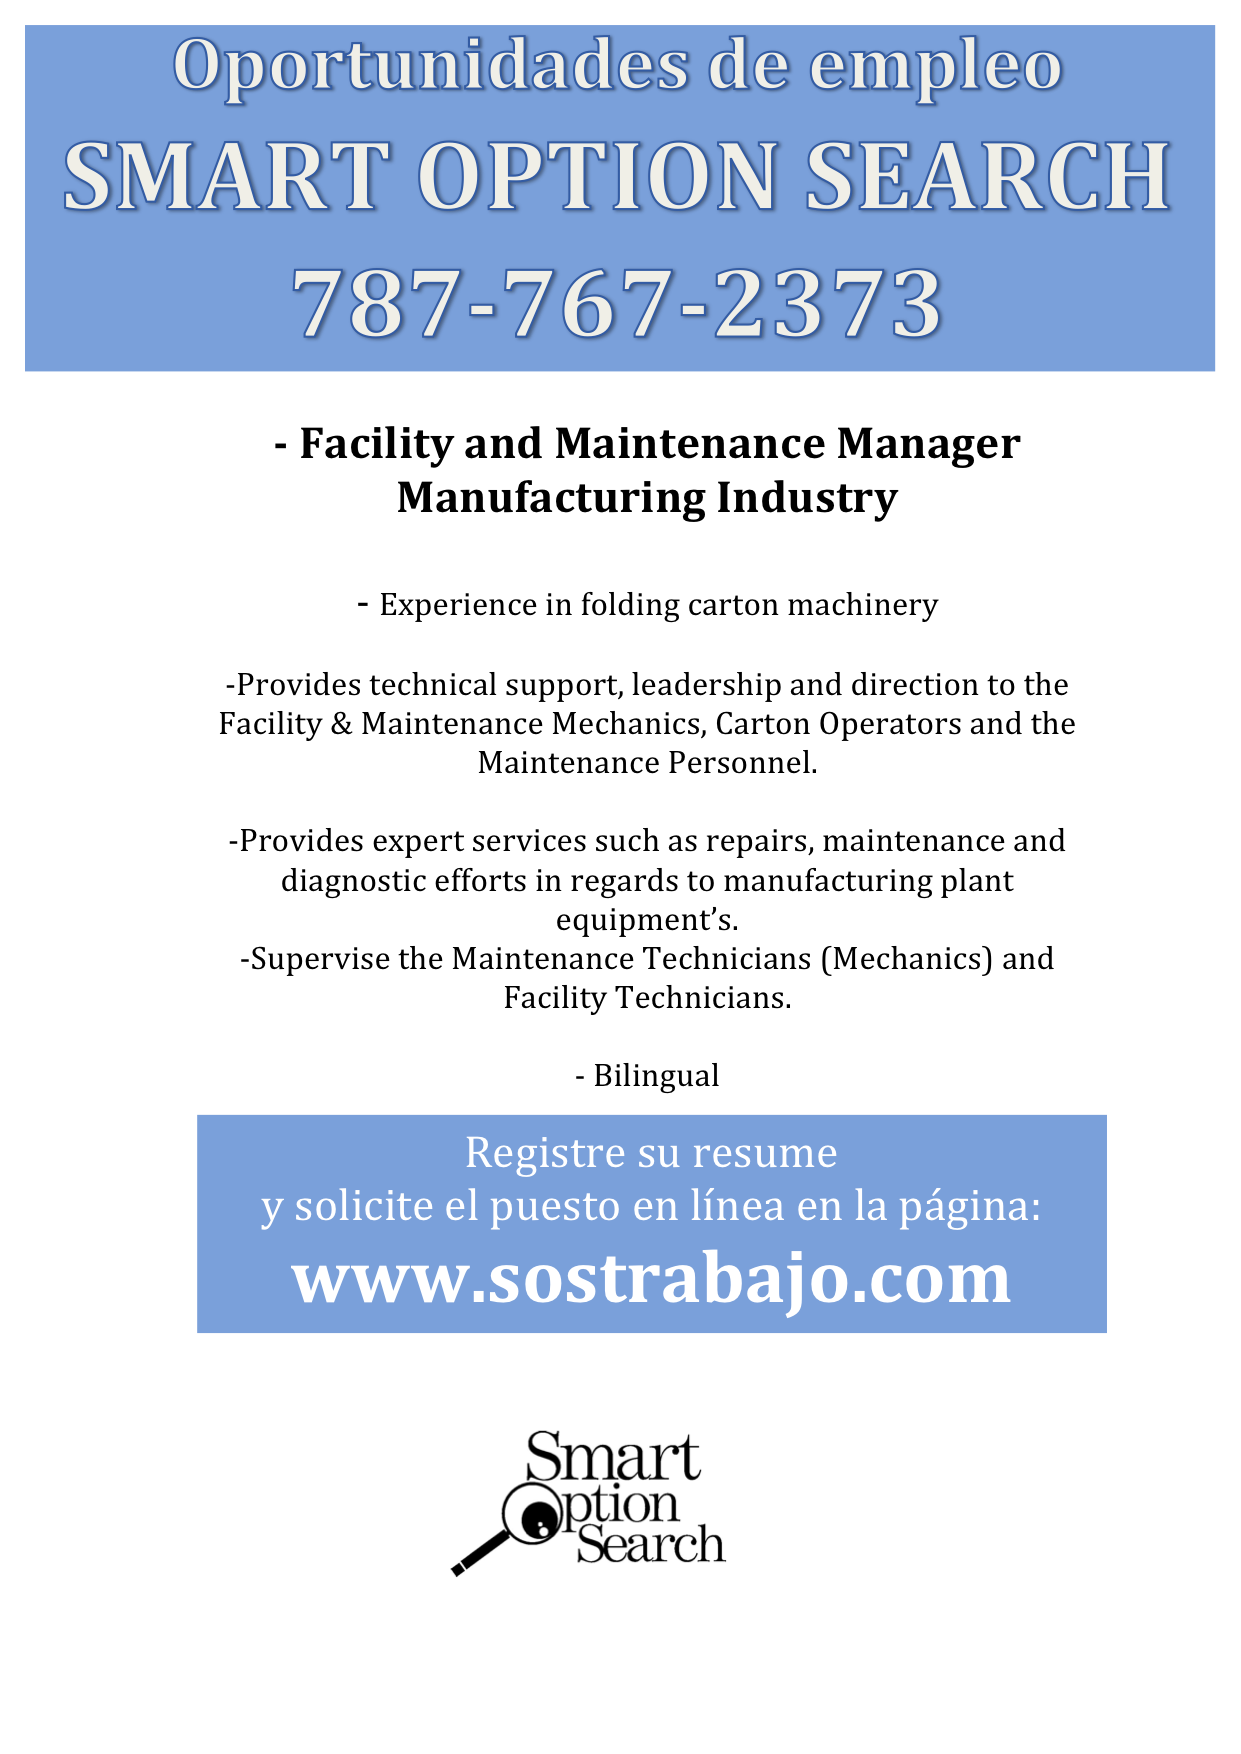 Facility Maintenance Manager Sample Resume Empleosjobs Facility & Maintenance Managerresumes A Franjen .